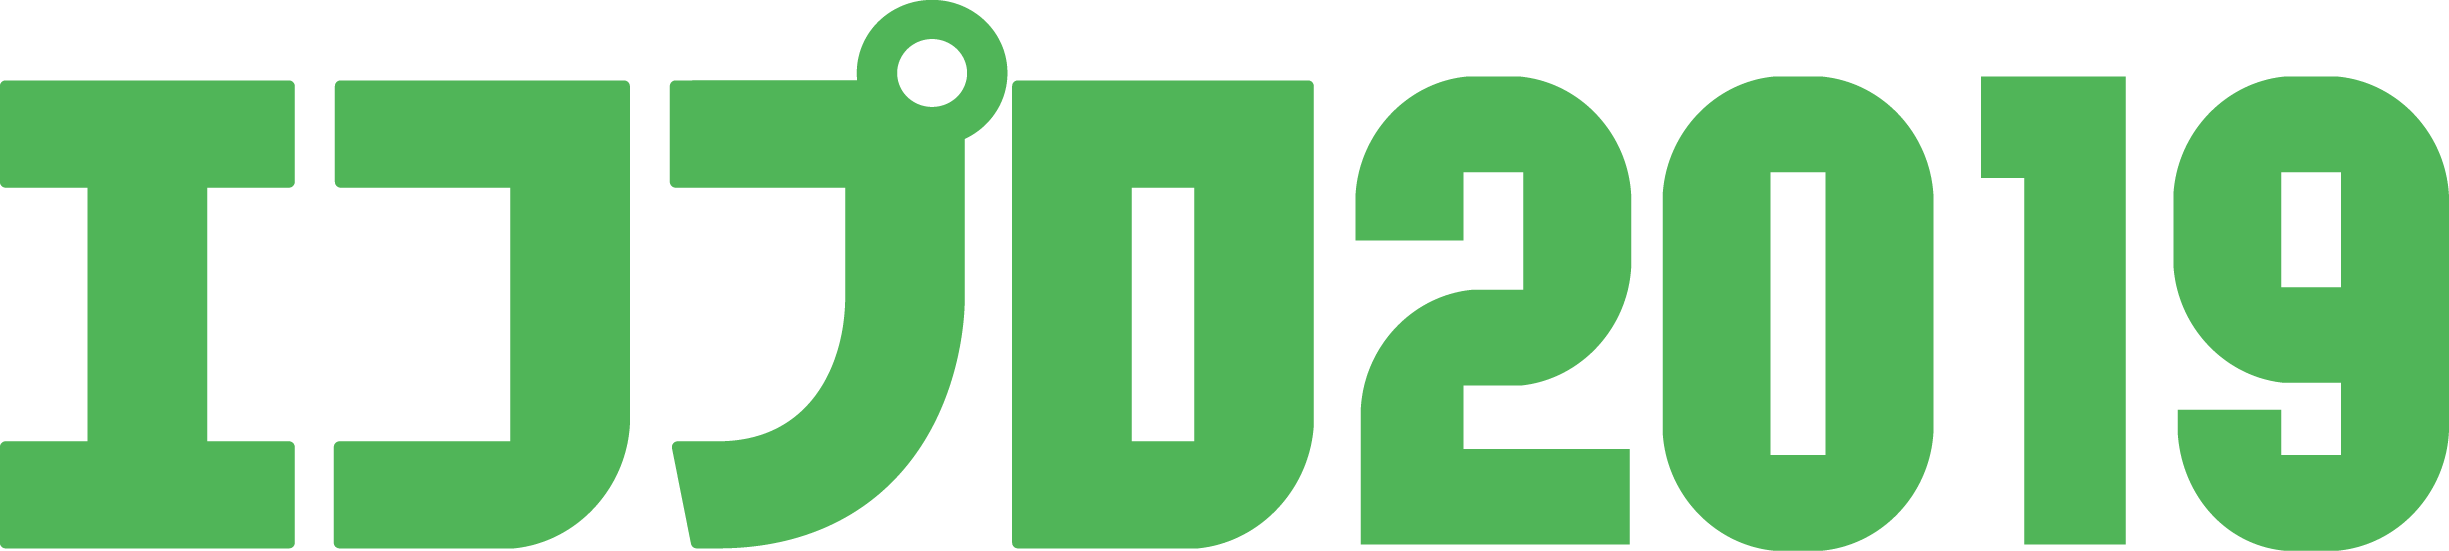 eco2019_logo_4c (003)